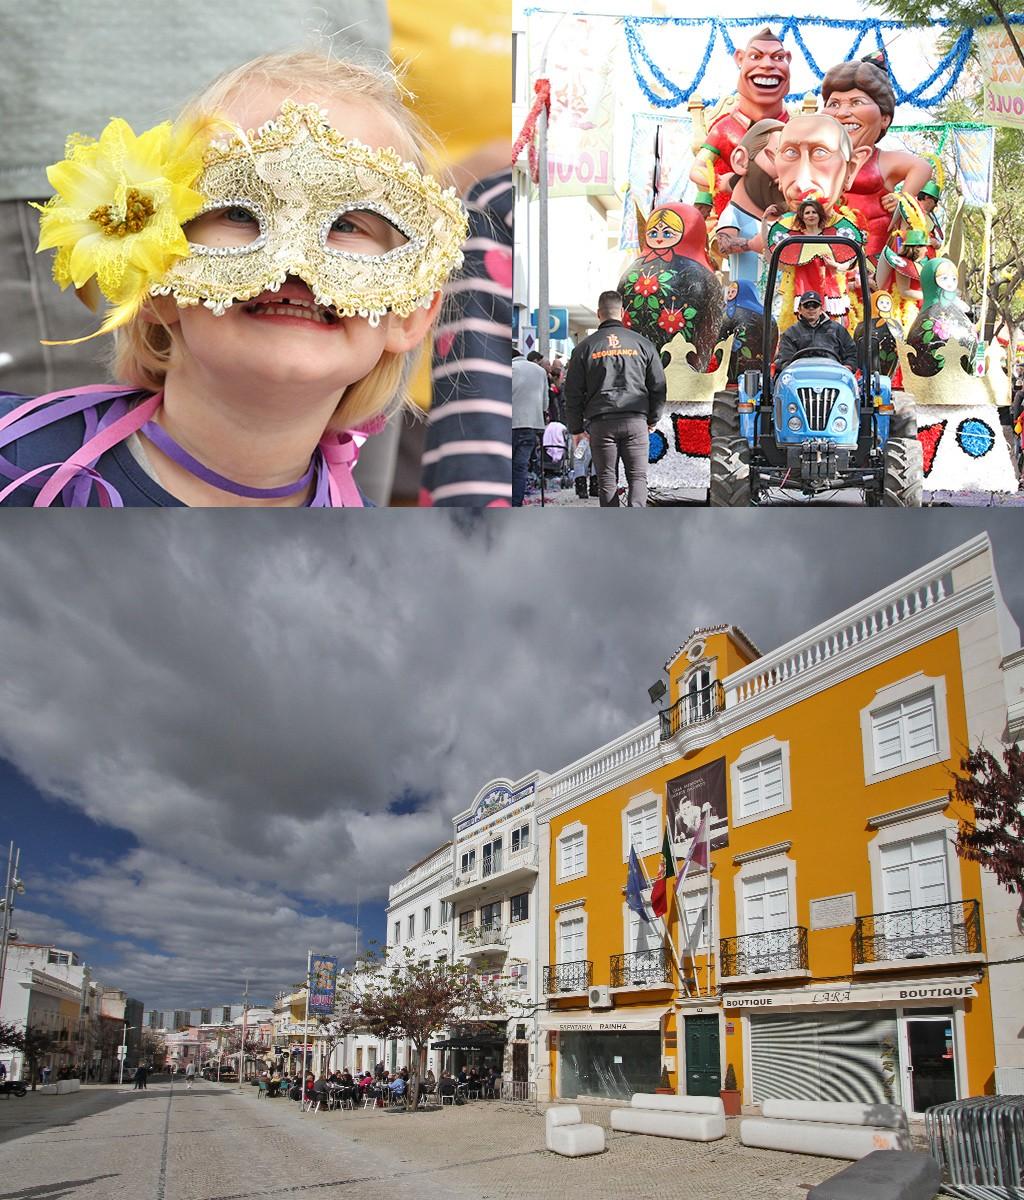 carnaval Loulé rotonde bij gemeentehuis